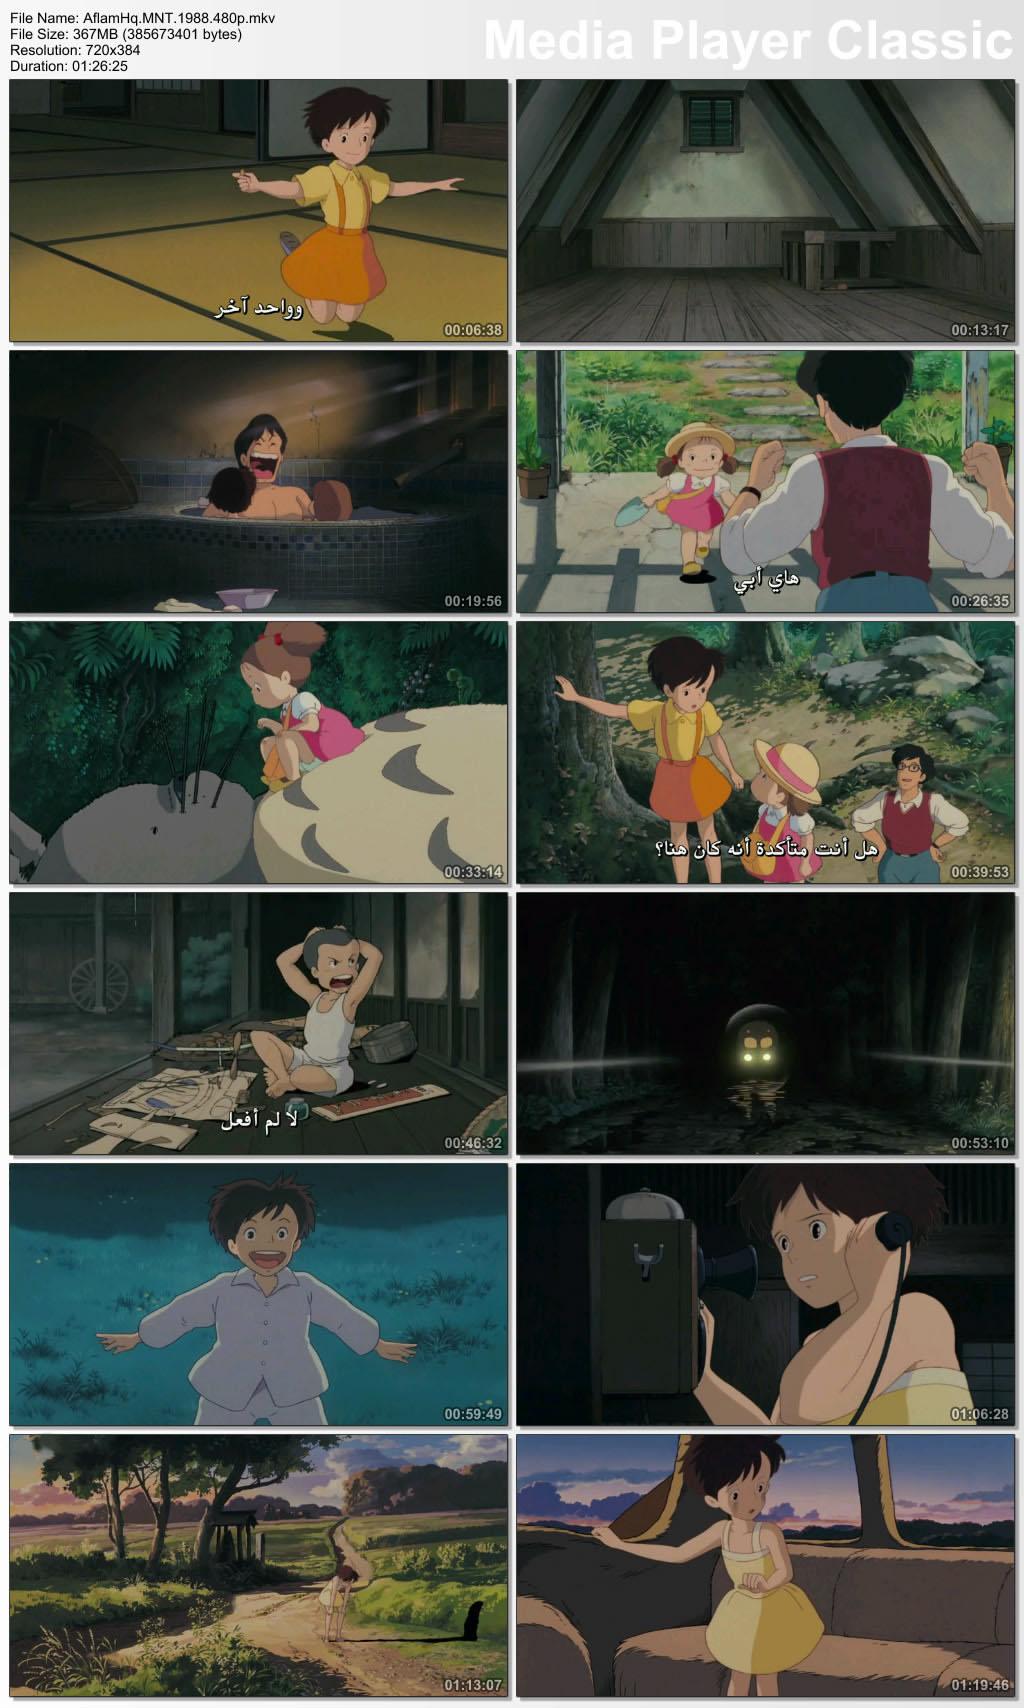 Neighbor Totoro 1988 720p BluRay 22478alsh3er.png